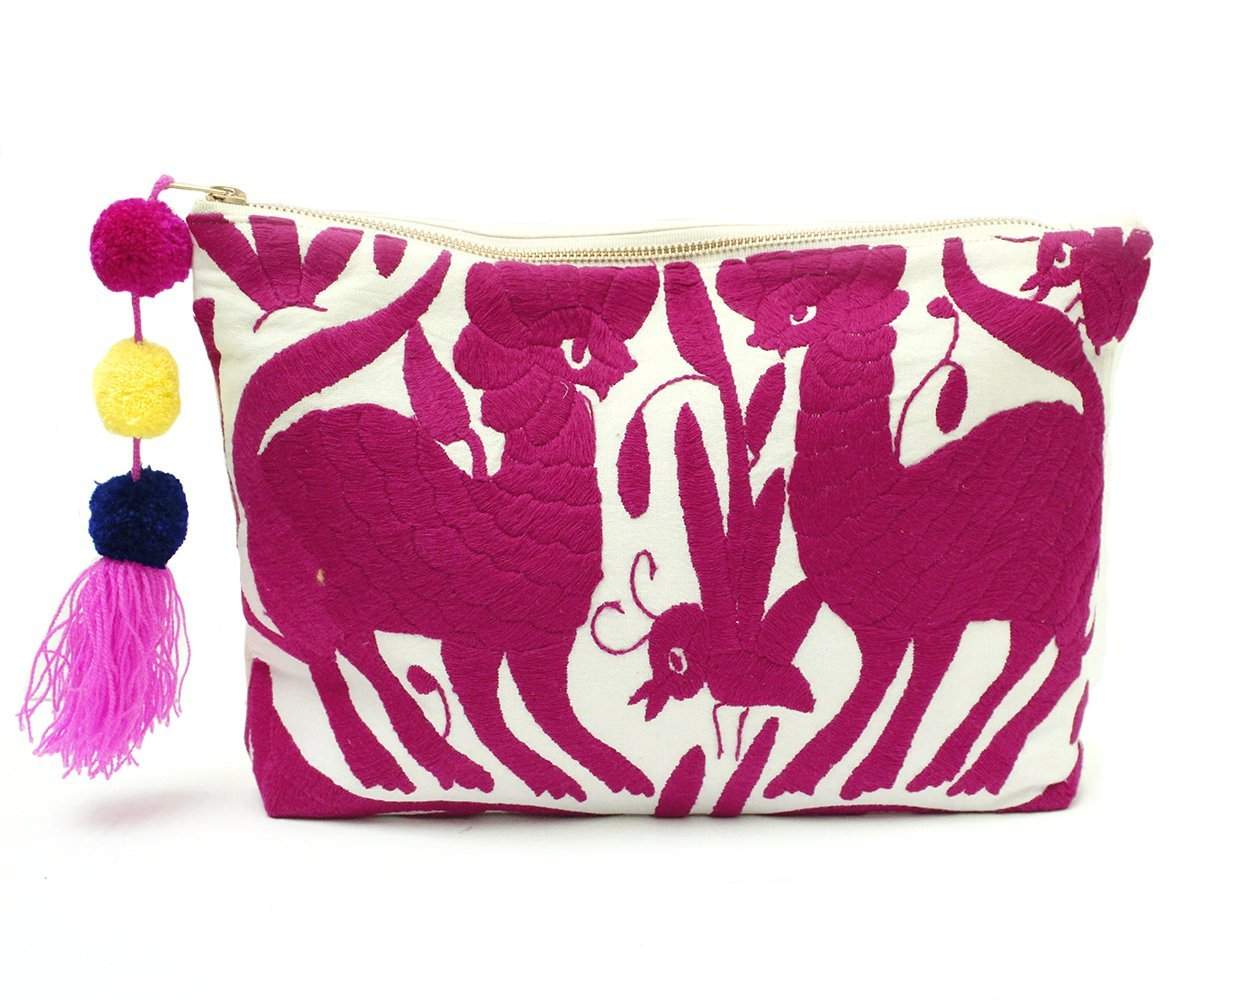 Fuchsia Oversized Clutch Handbag